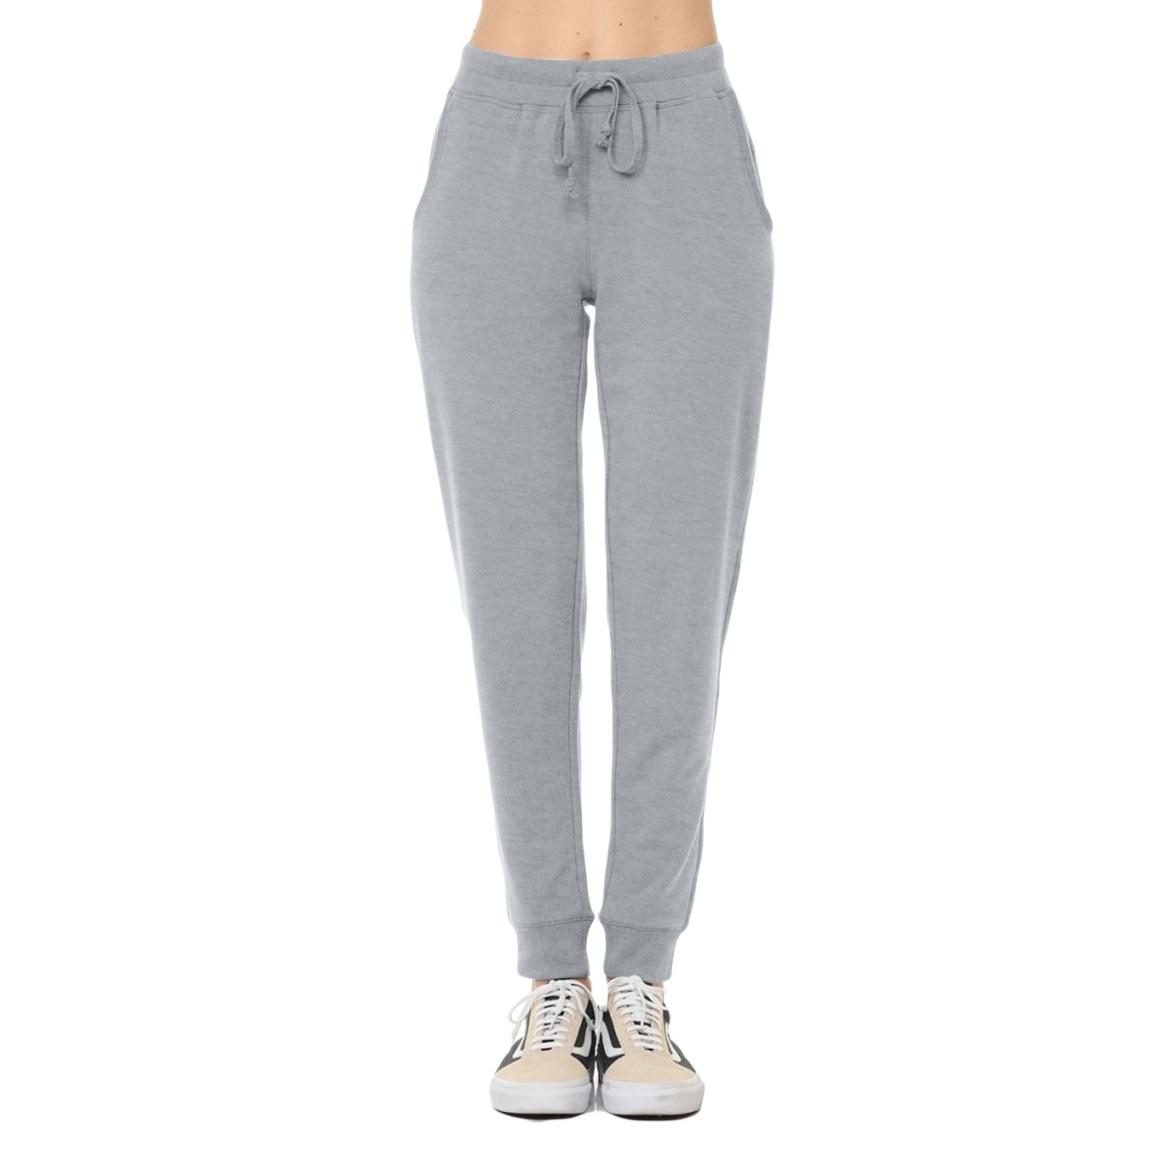 Envlon Womens Yoga Sweatpants with Pockets Drawstring Cuff Joggers Workout Pants Elastic Waist Casual Lounge Pants